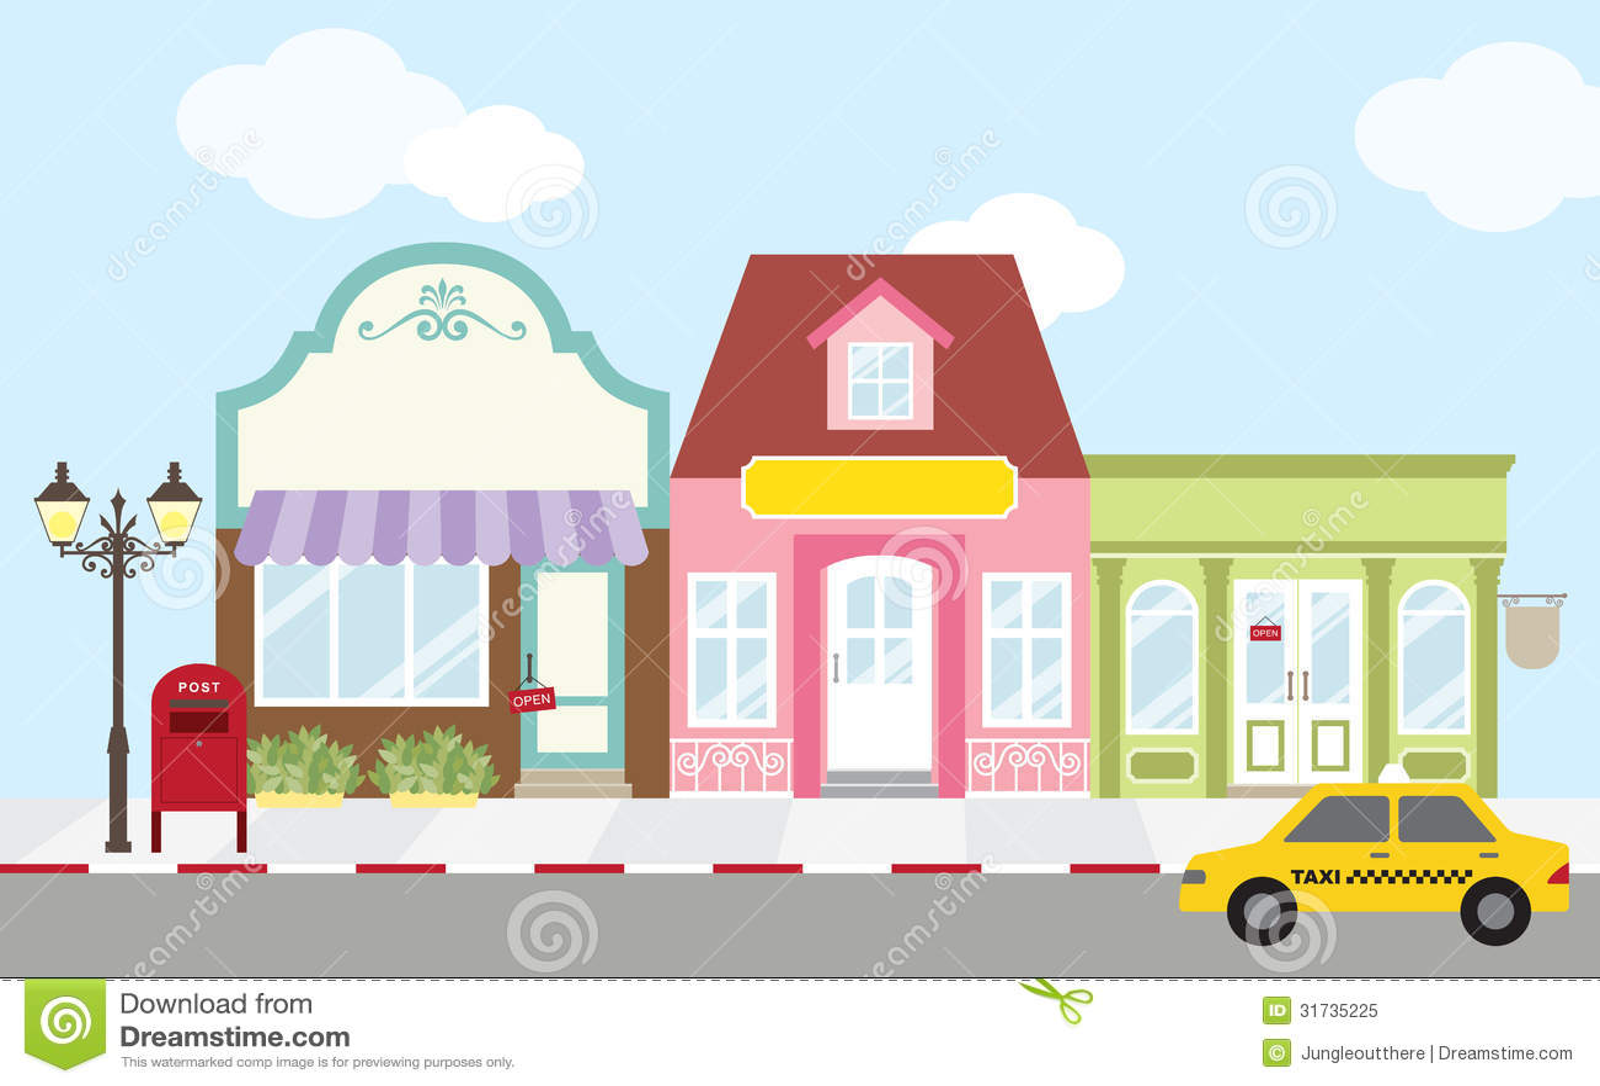 Shopping Street Royalty Free Stock Photo - Image: 31735225